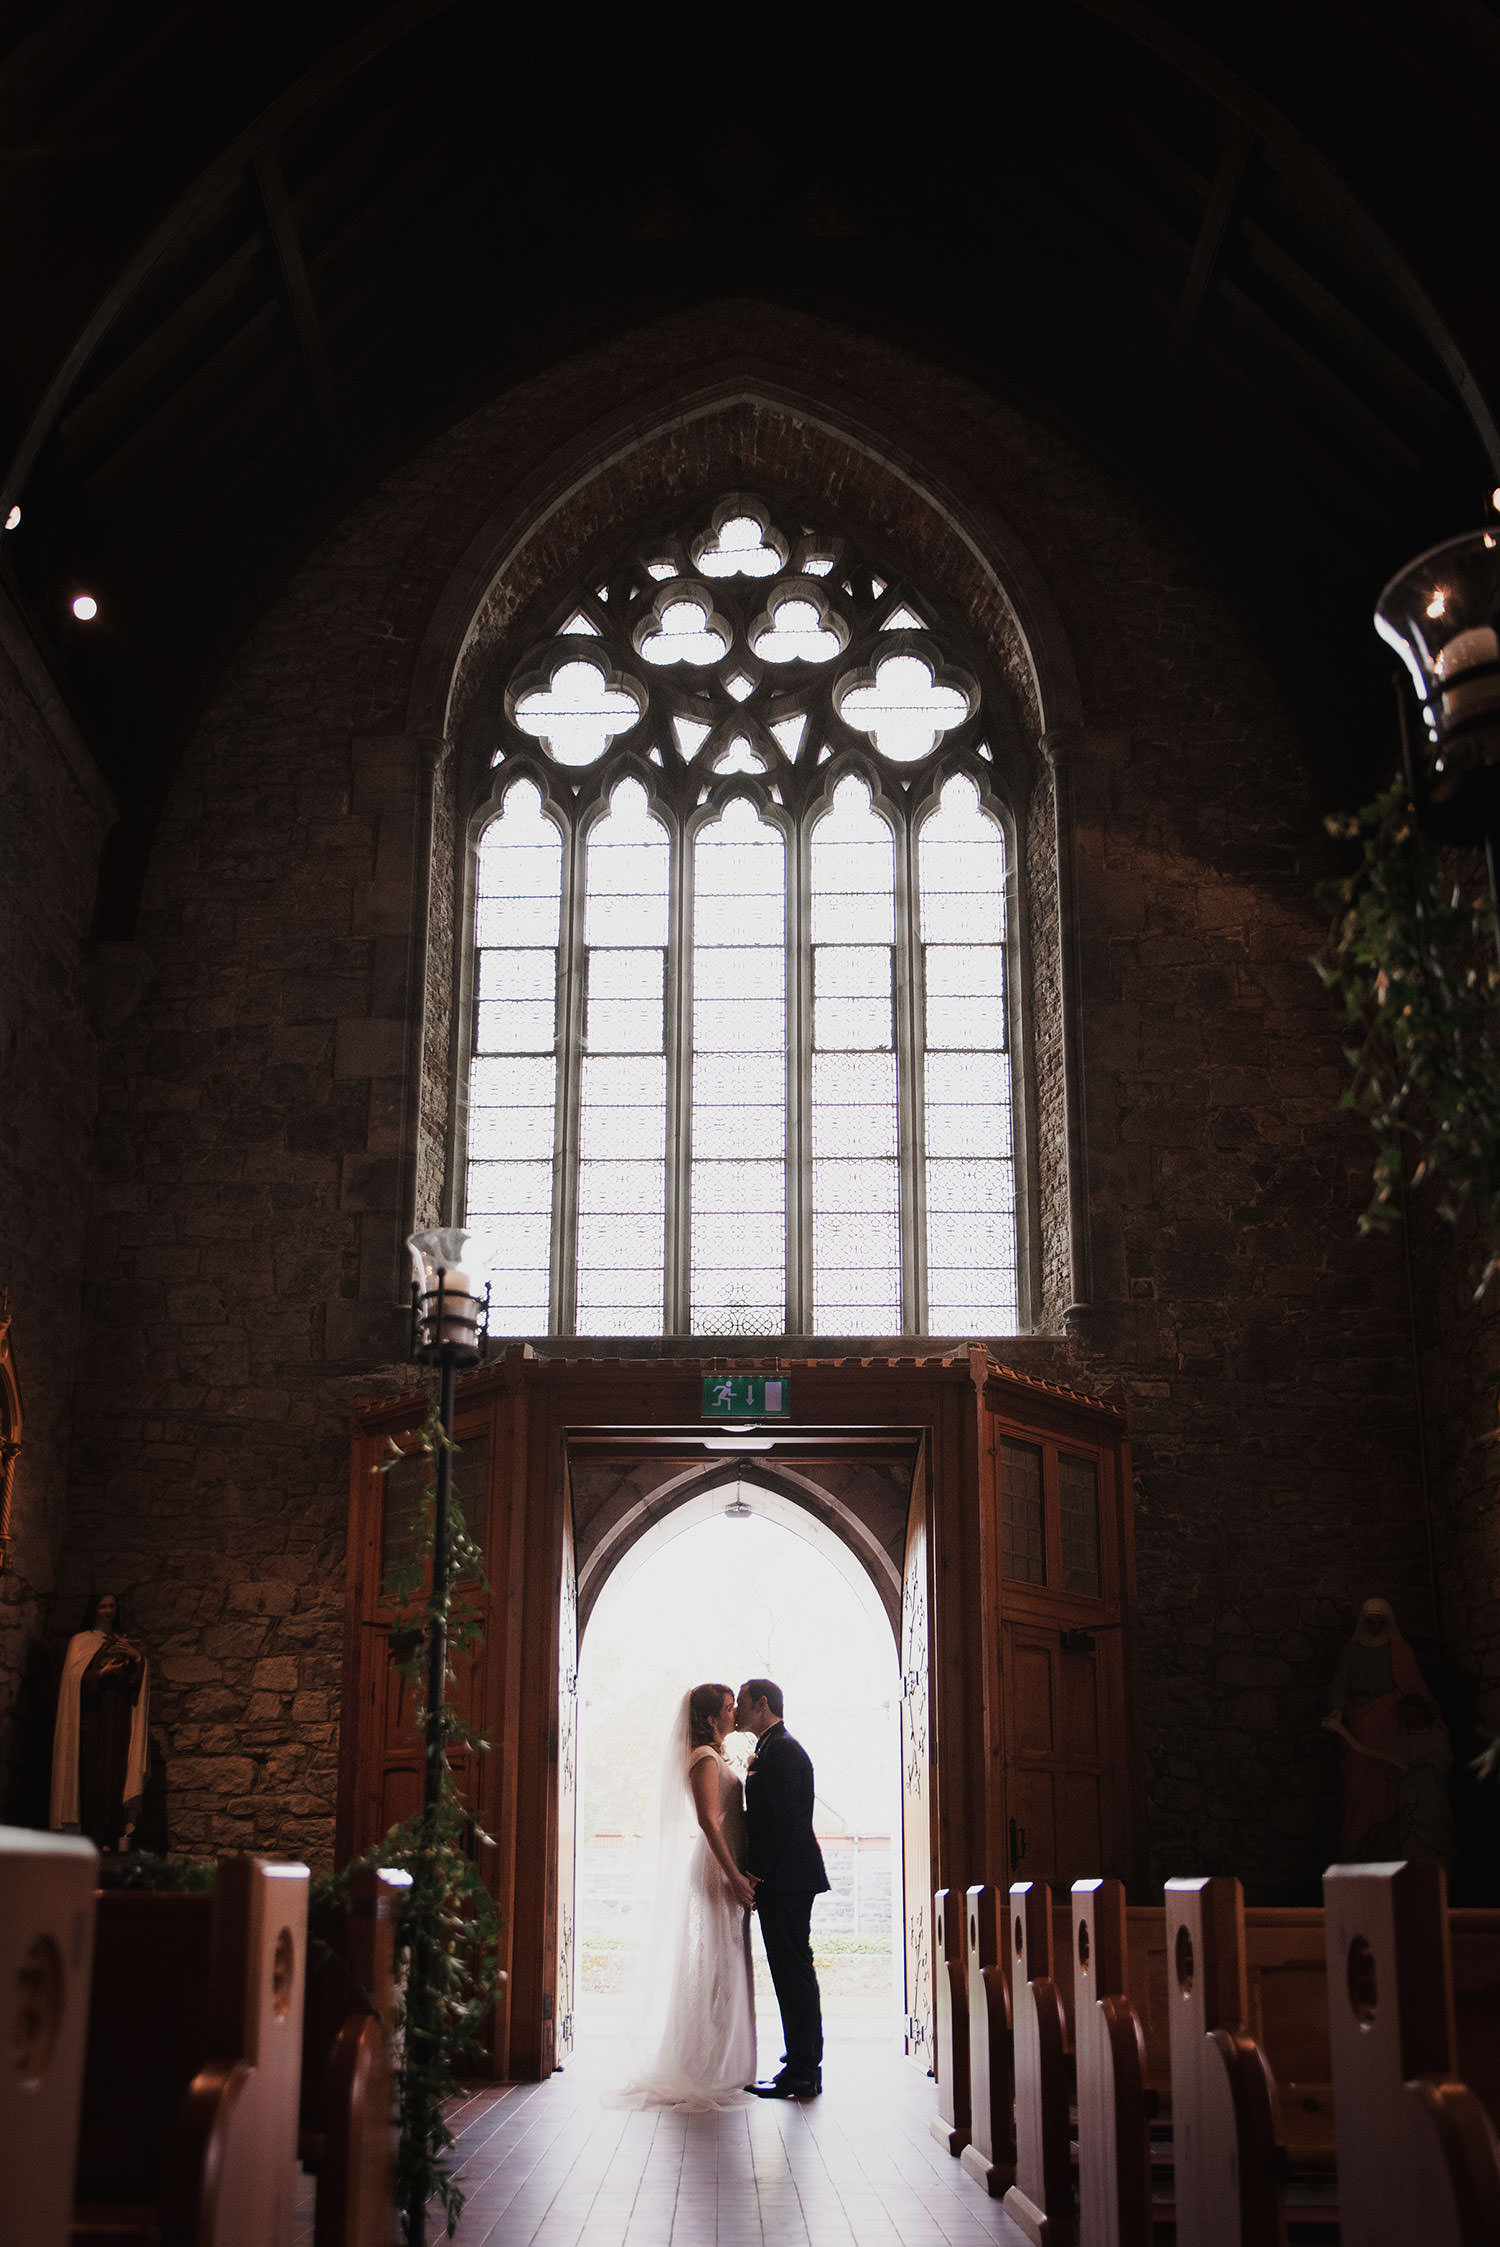 dunraven-arms-wedding-photography-101.jpg